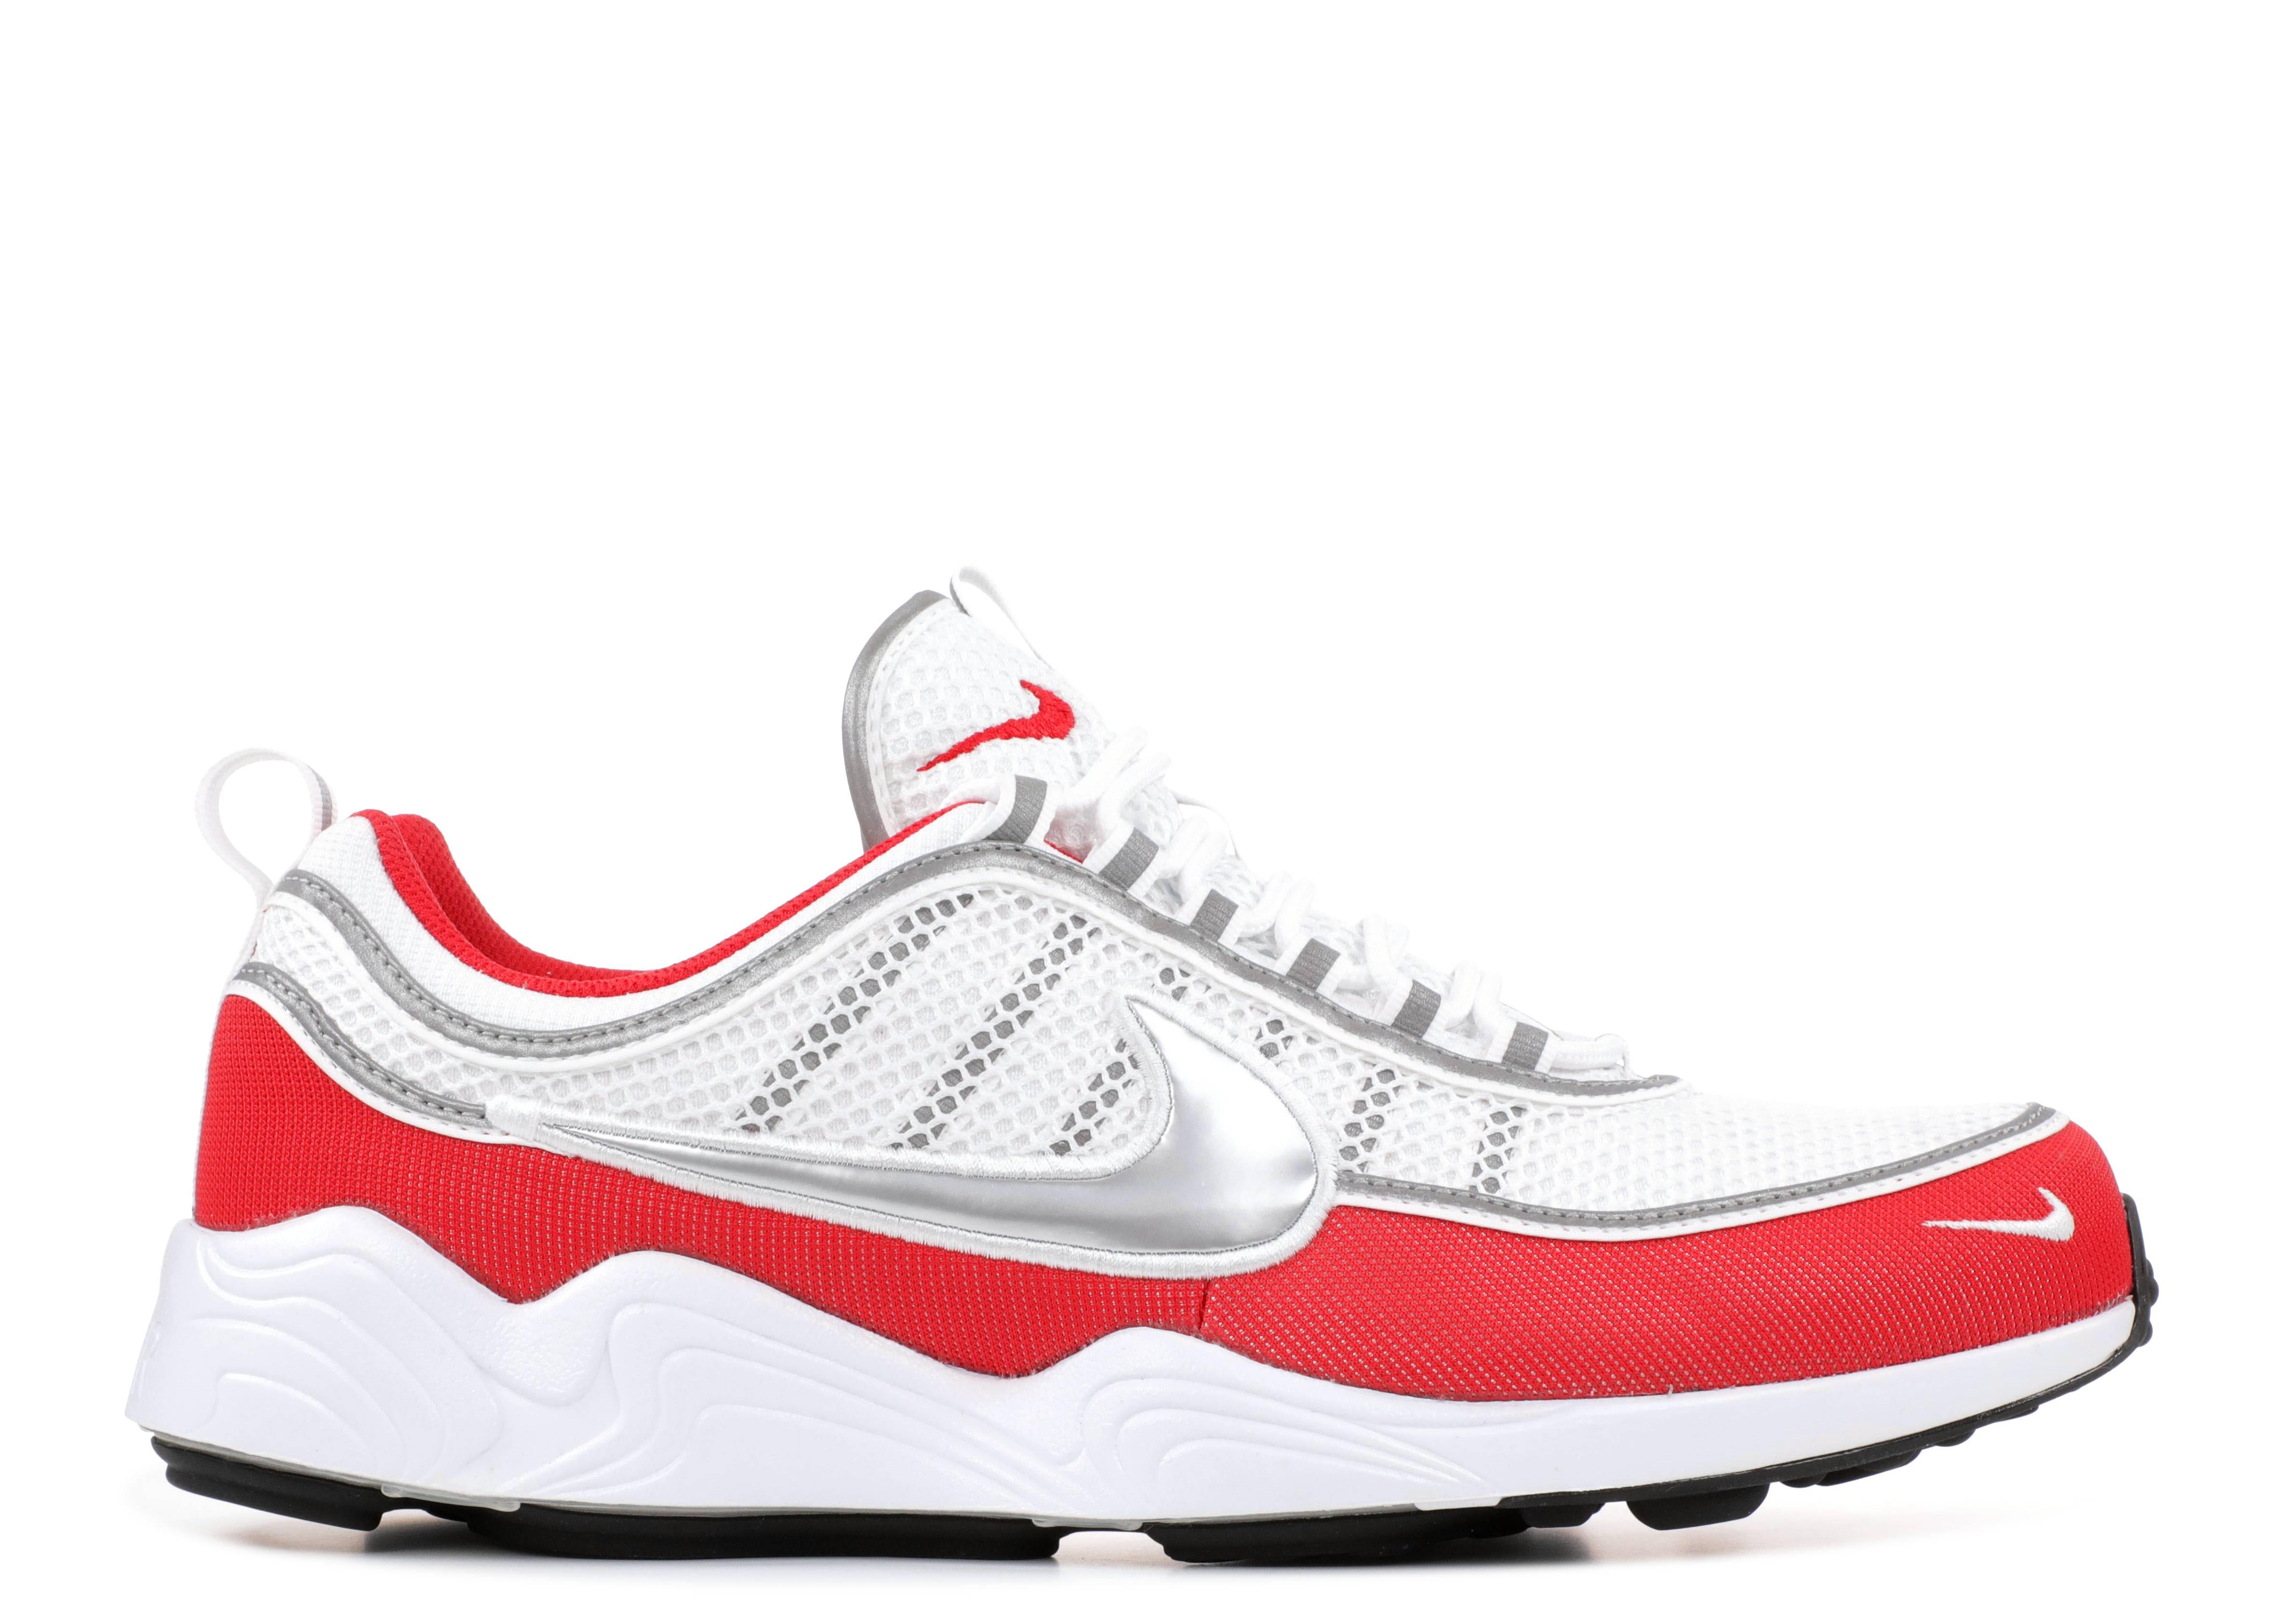 Nike Zoom Spiridon Ultra OG Metallic Silver Red Shoe Green